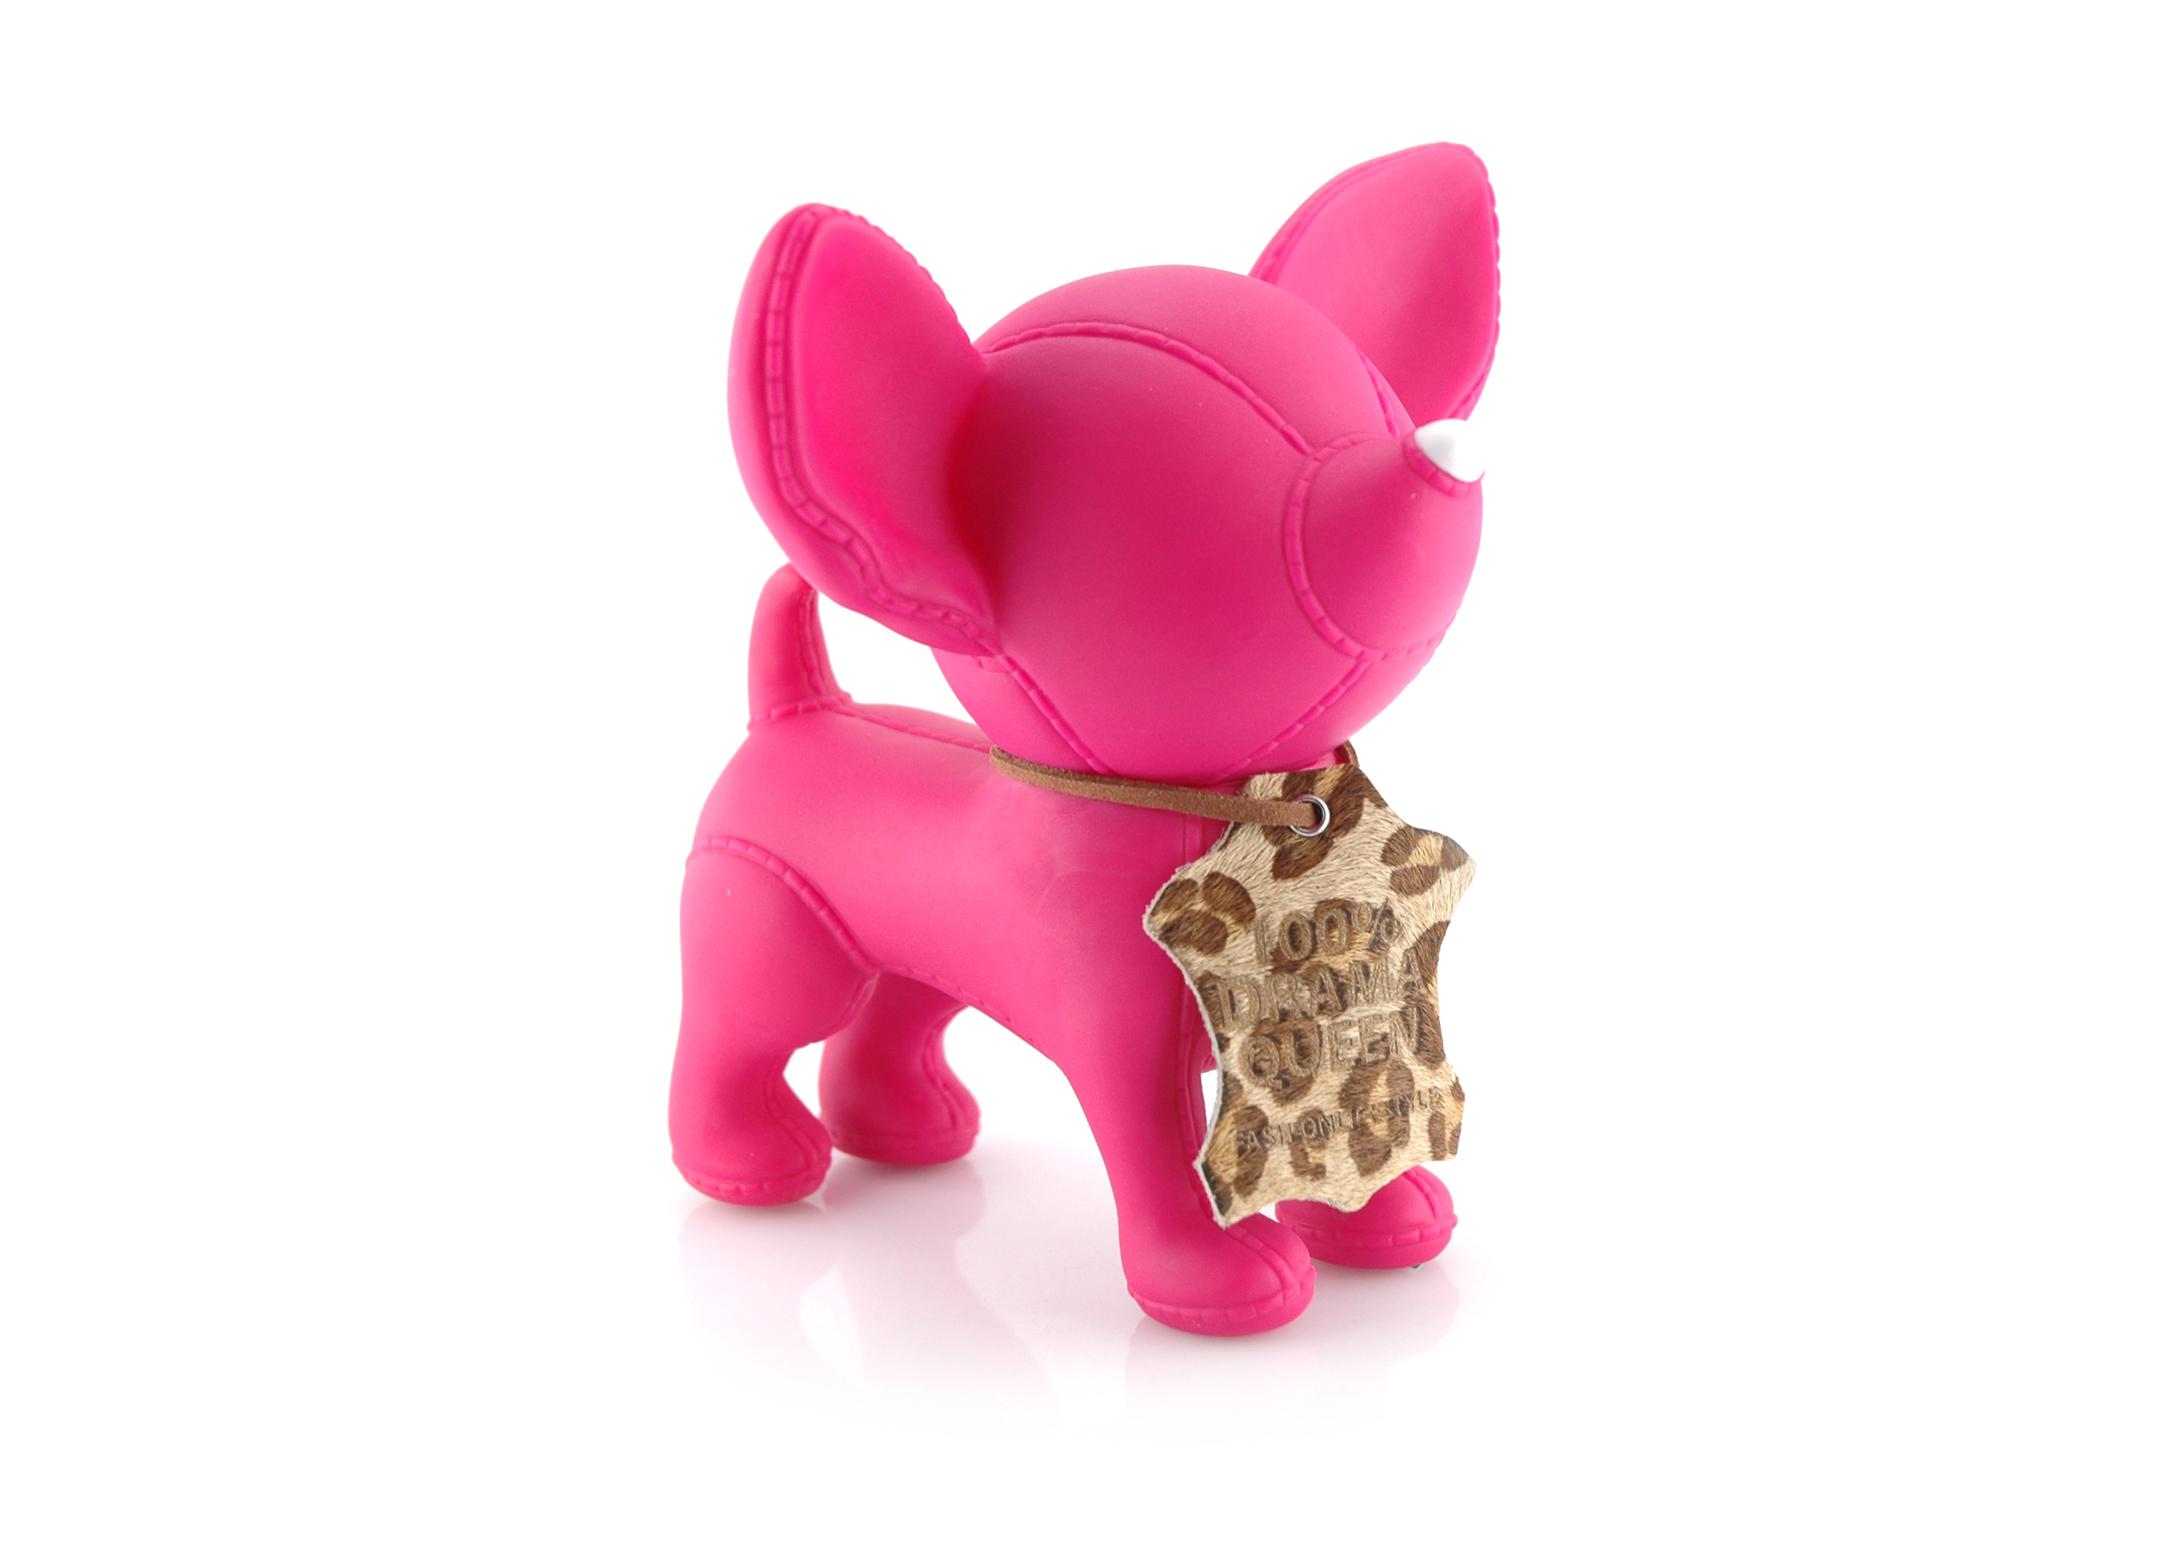 Whaa Whaa Doggybank Chihuahua Drama Queen Money-Box